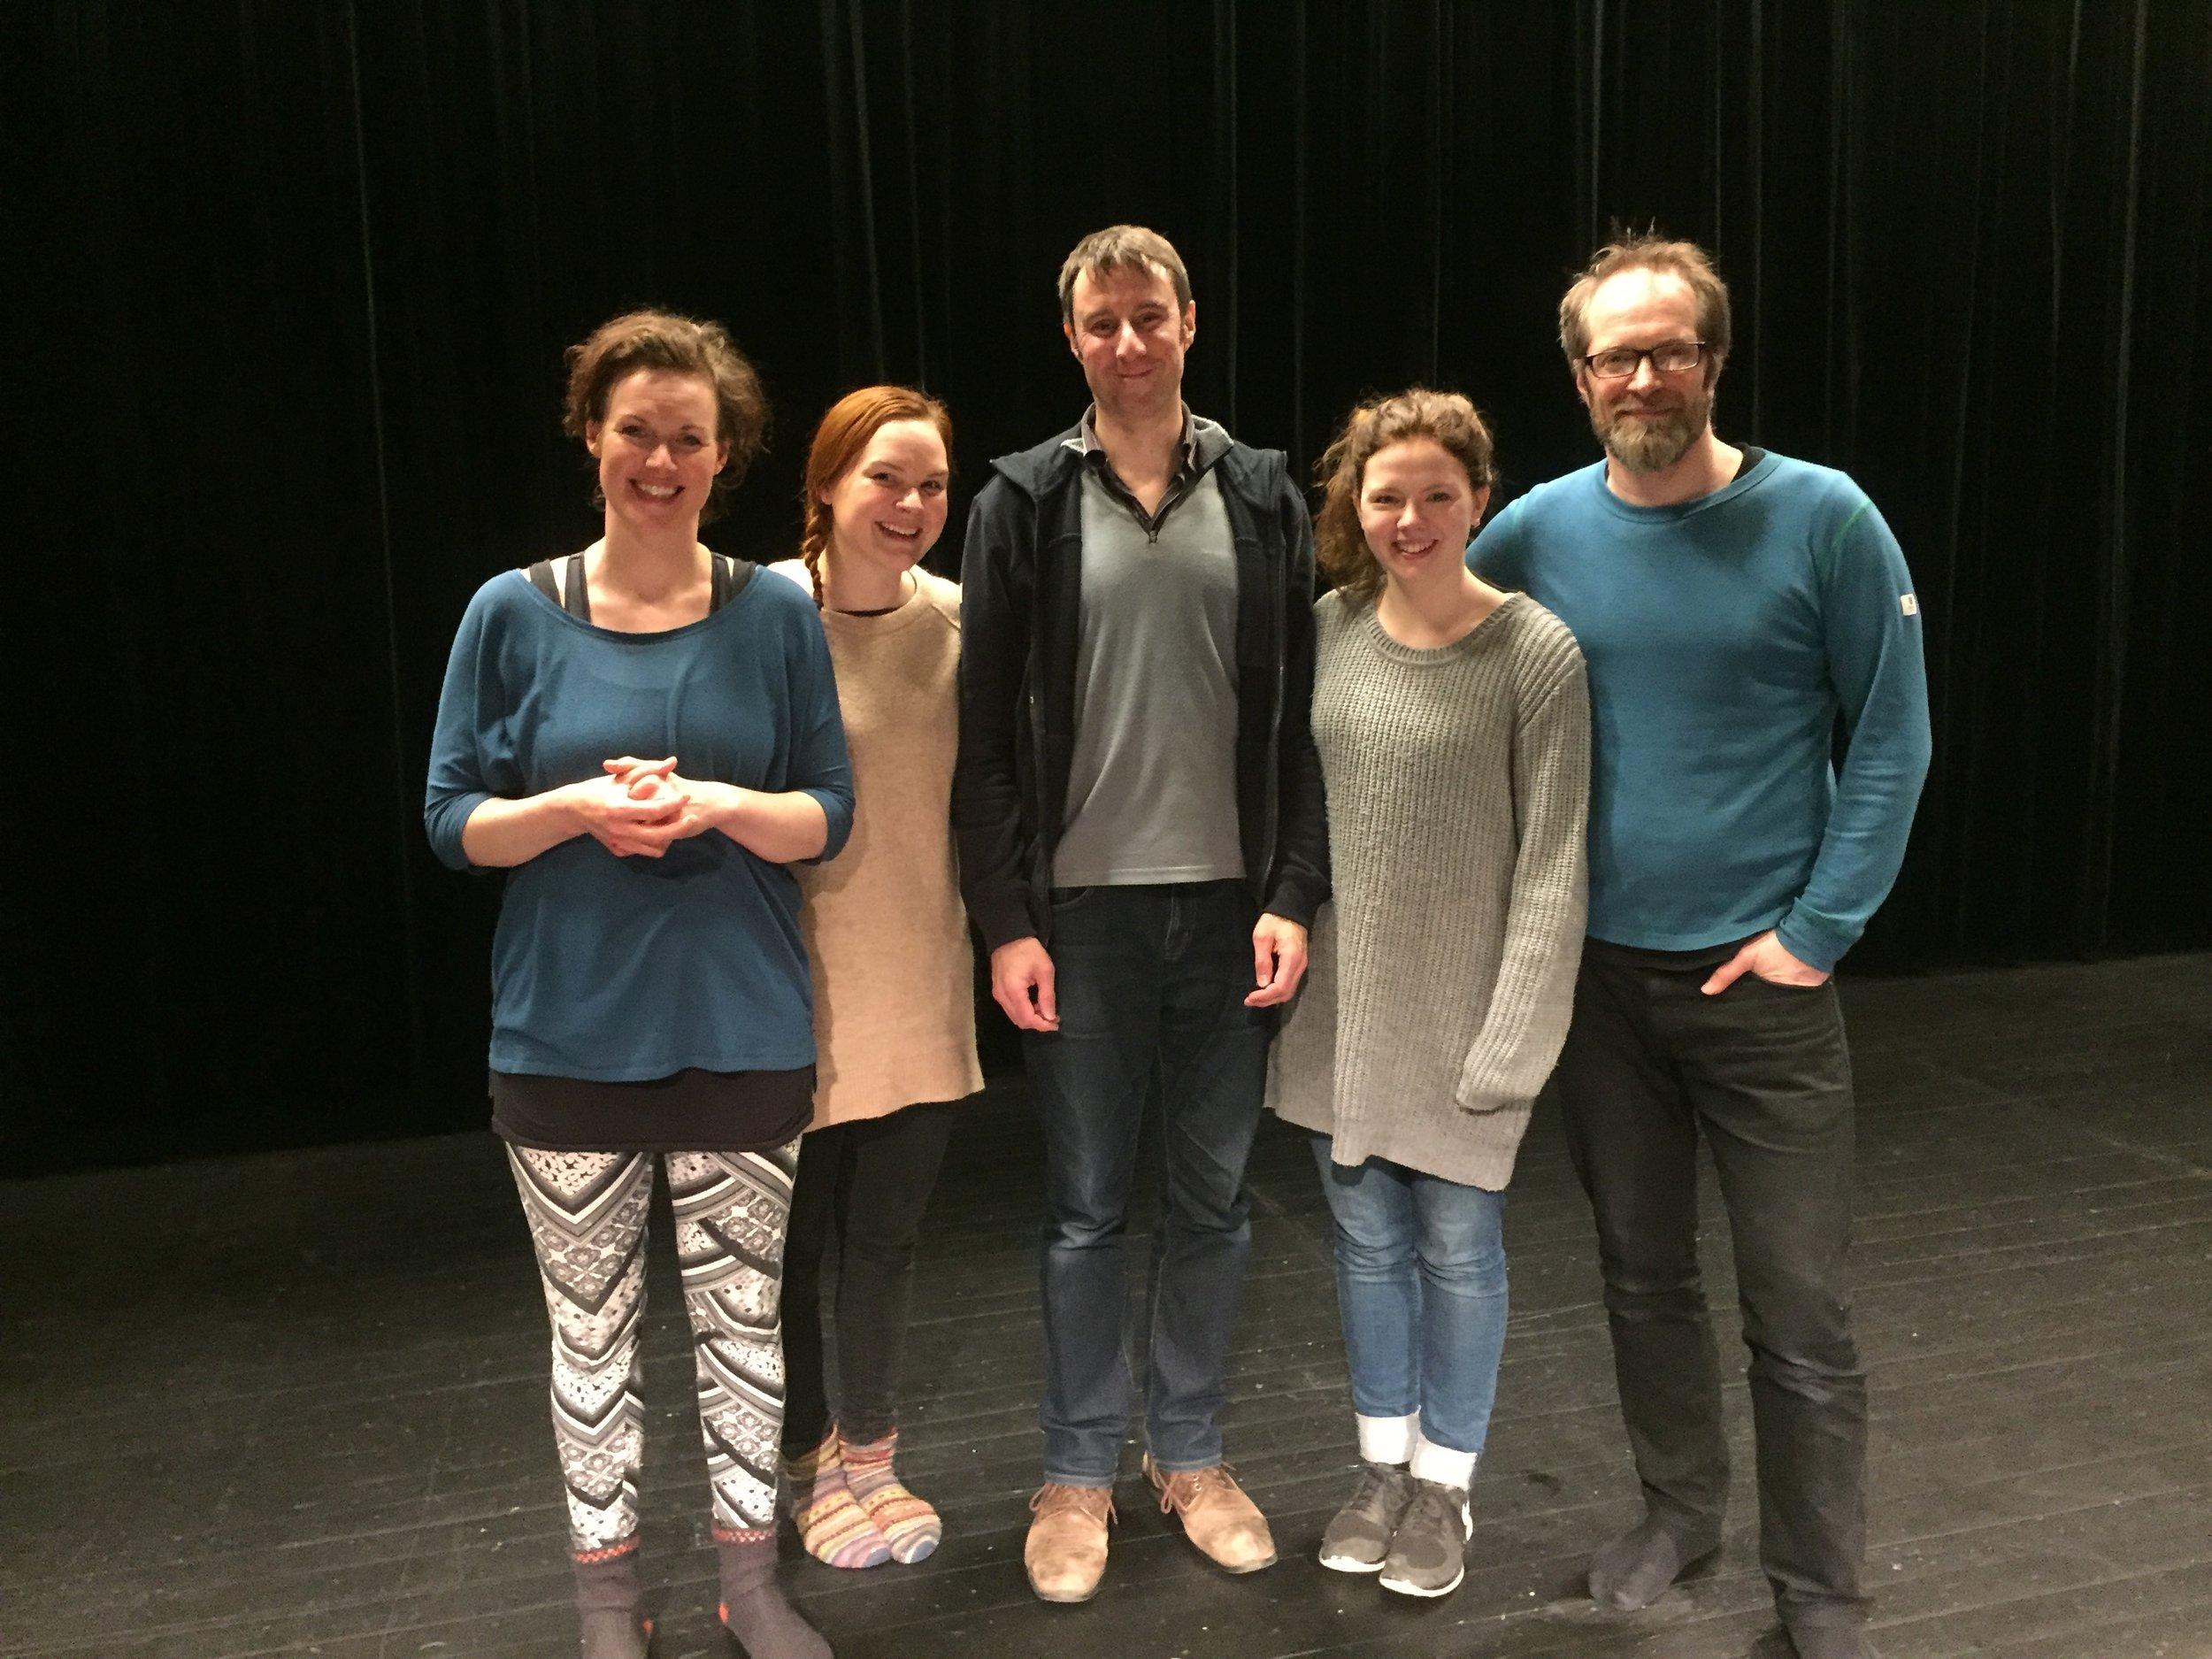 Instruktør Dominic Kelley saman med skodespelarane på forteljar-workshop: Idun Losnegård, Odal Alisøy, Reidun Melvær Berge og Kyrre Eikås Ottersen.